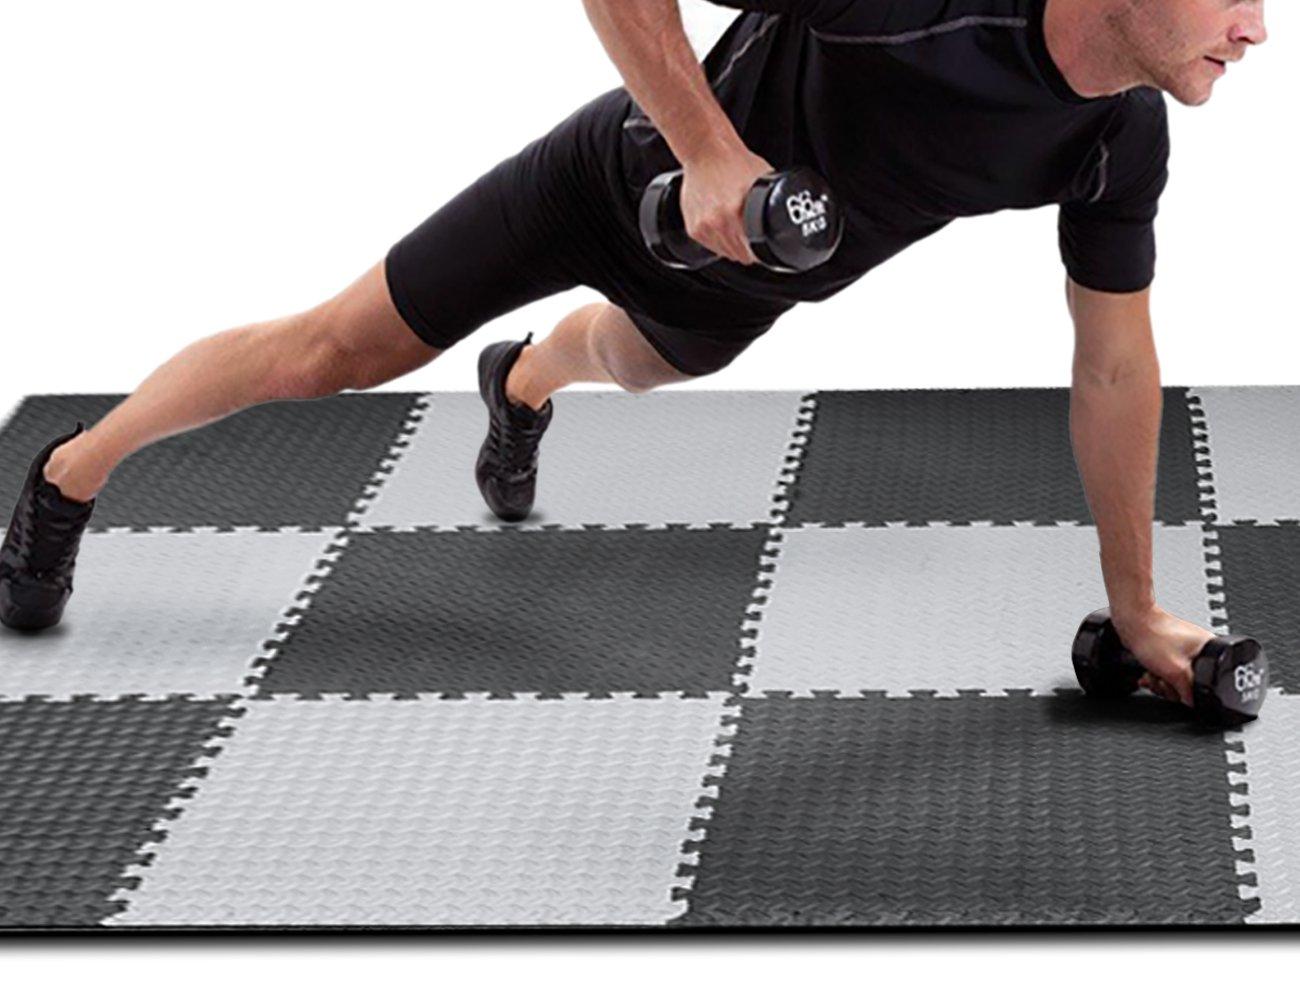 Innhom Gym Flooring Mat Interlocking Foam Mats Puzzle